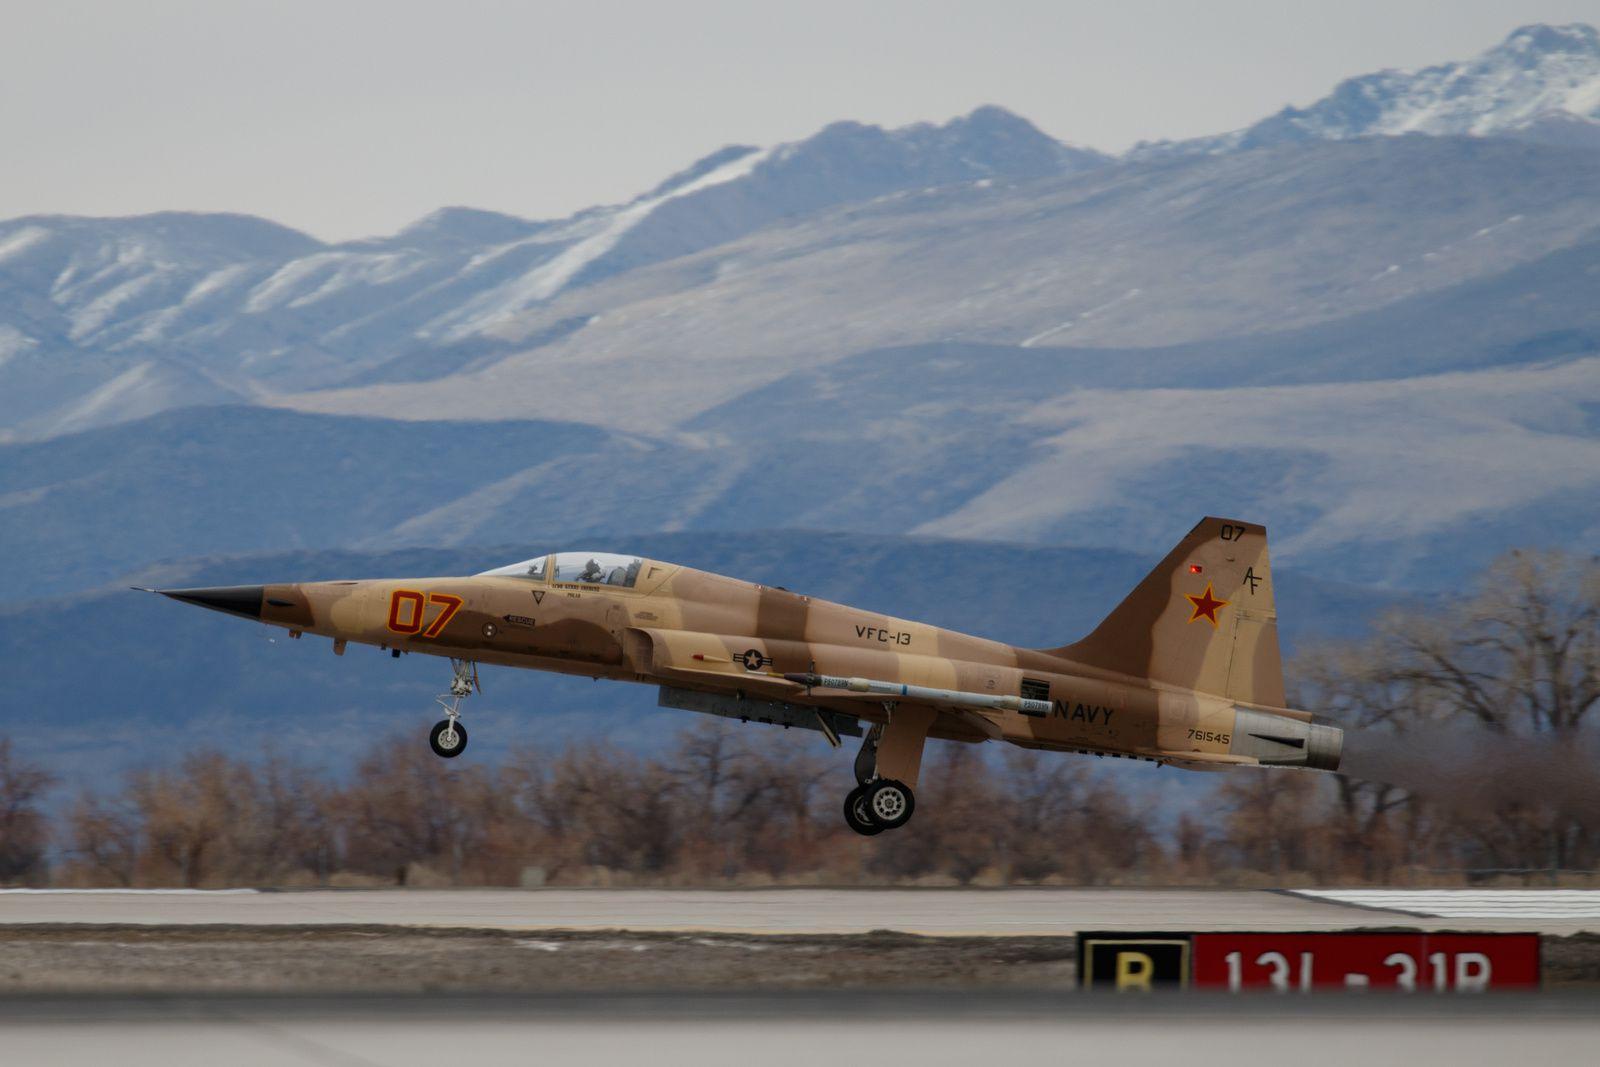 PHOTOS - Entrez dans la légendaire Navy Fighter Weapons School (Top Gun)